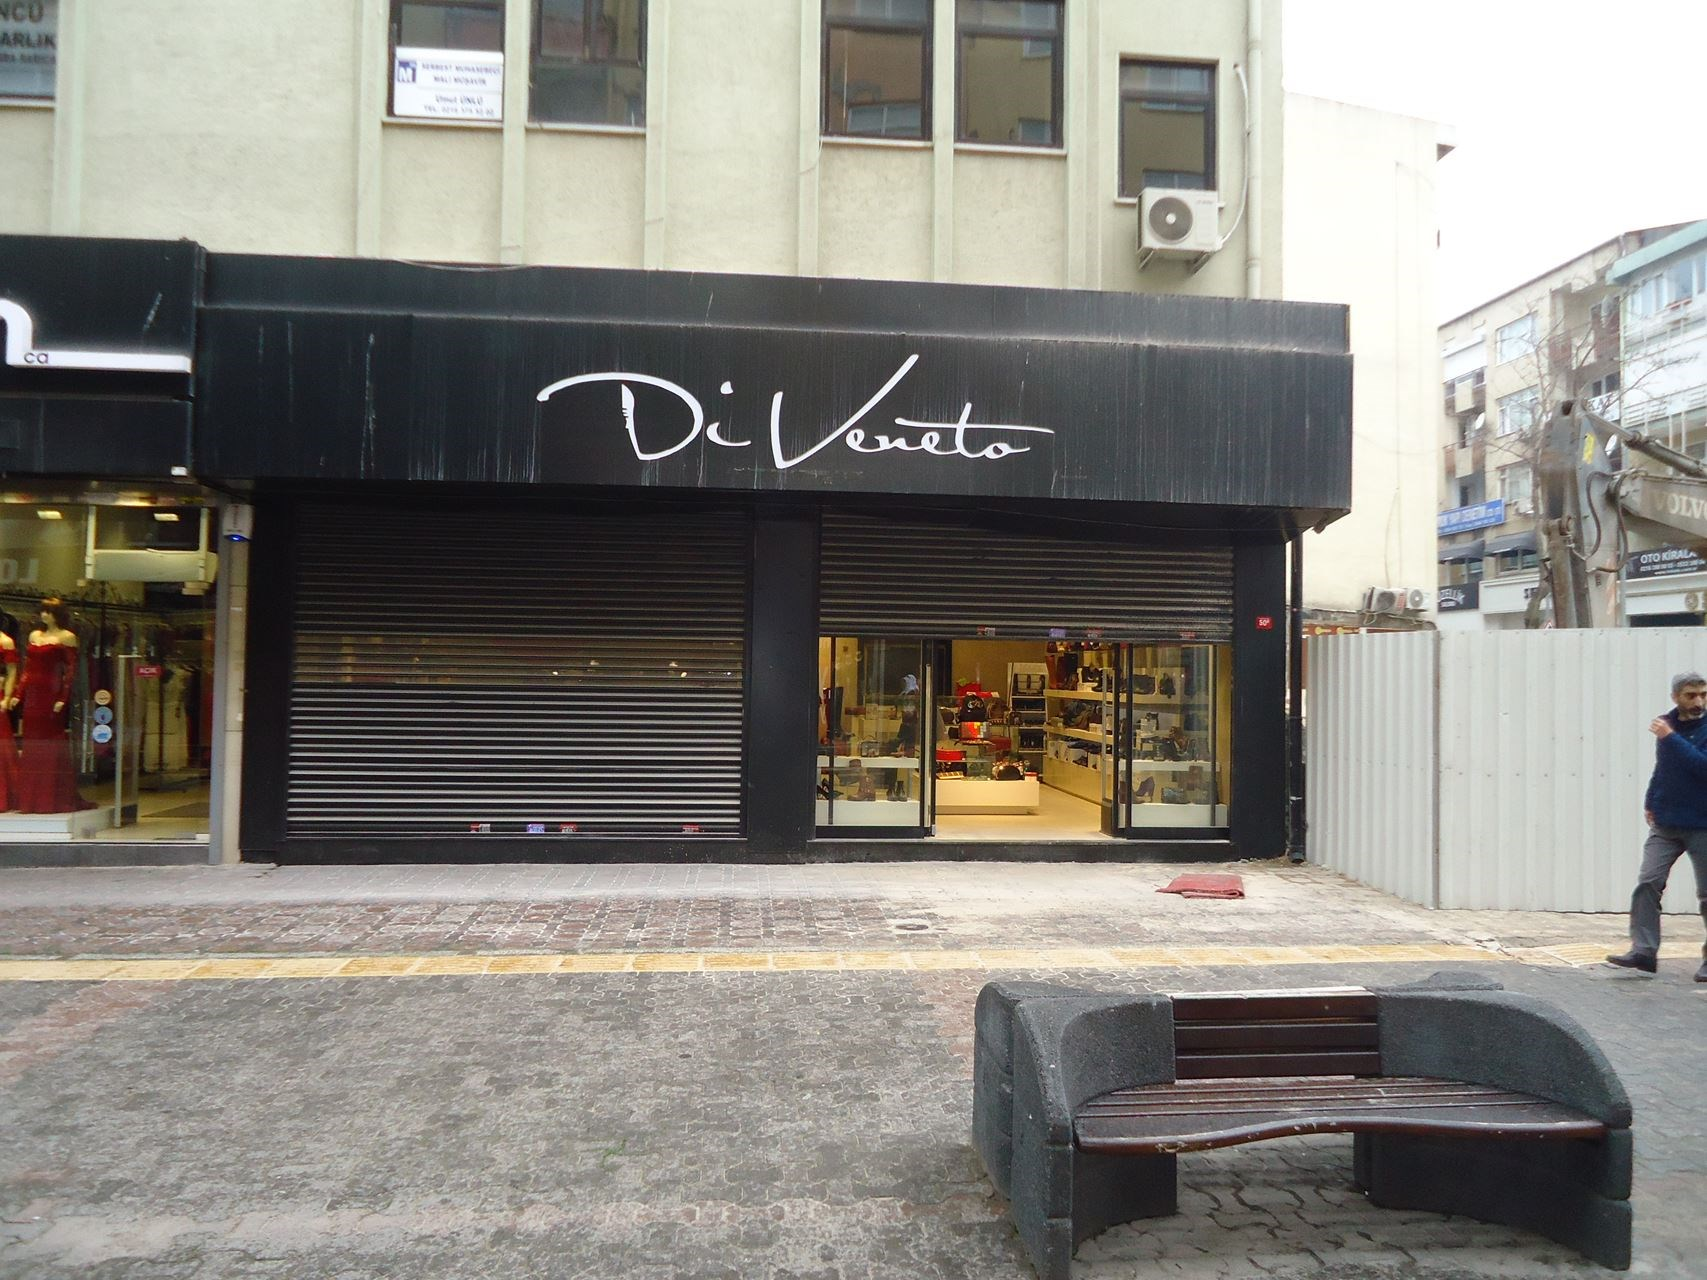 19 mayı caddesi kiralık mağaza